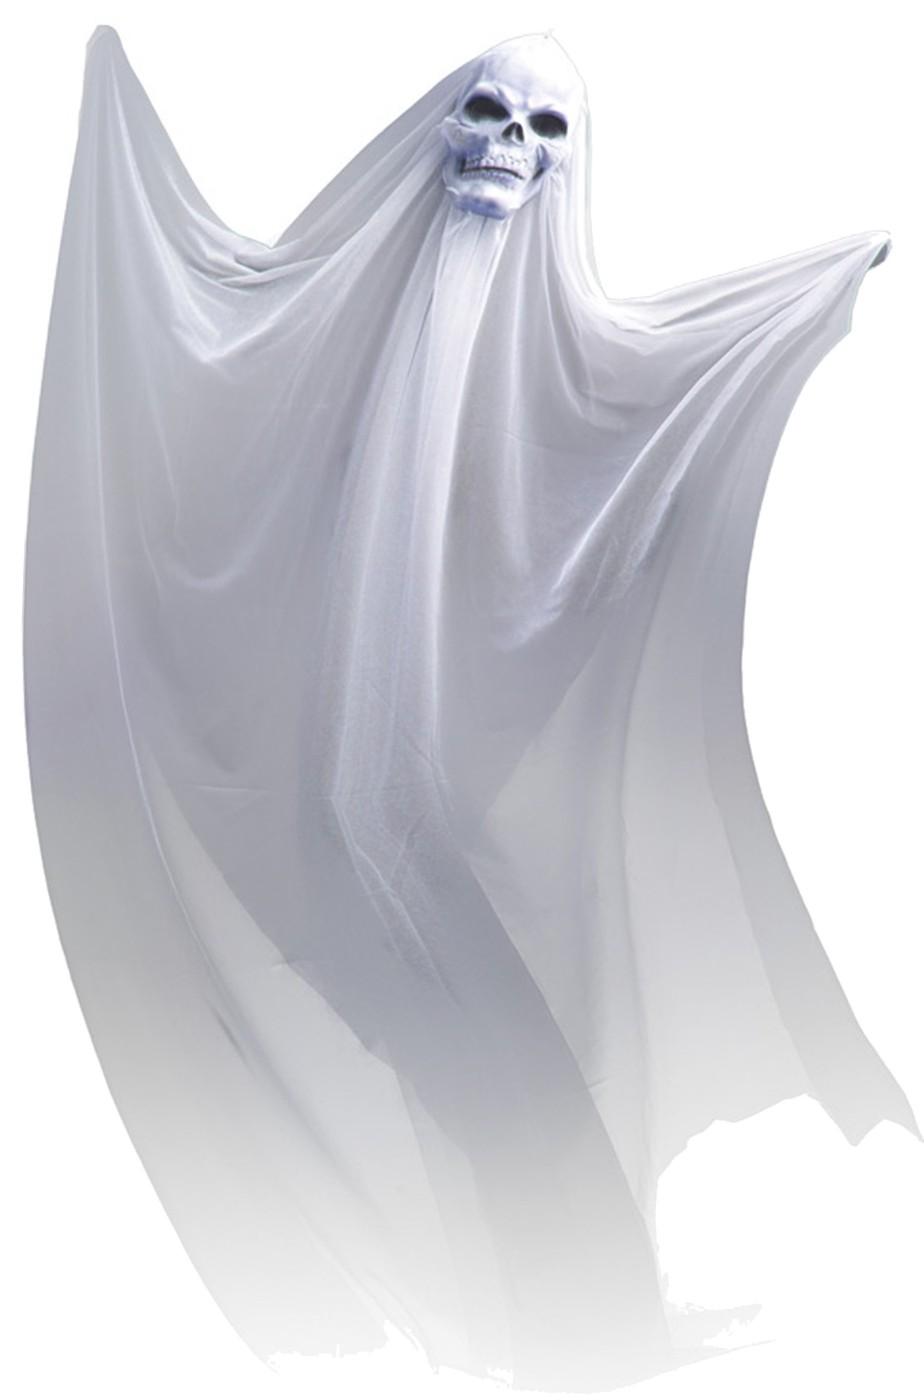 Fantasma Horror da appendere. 160cm!